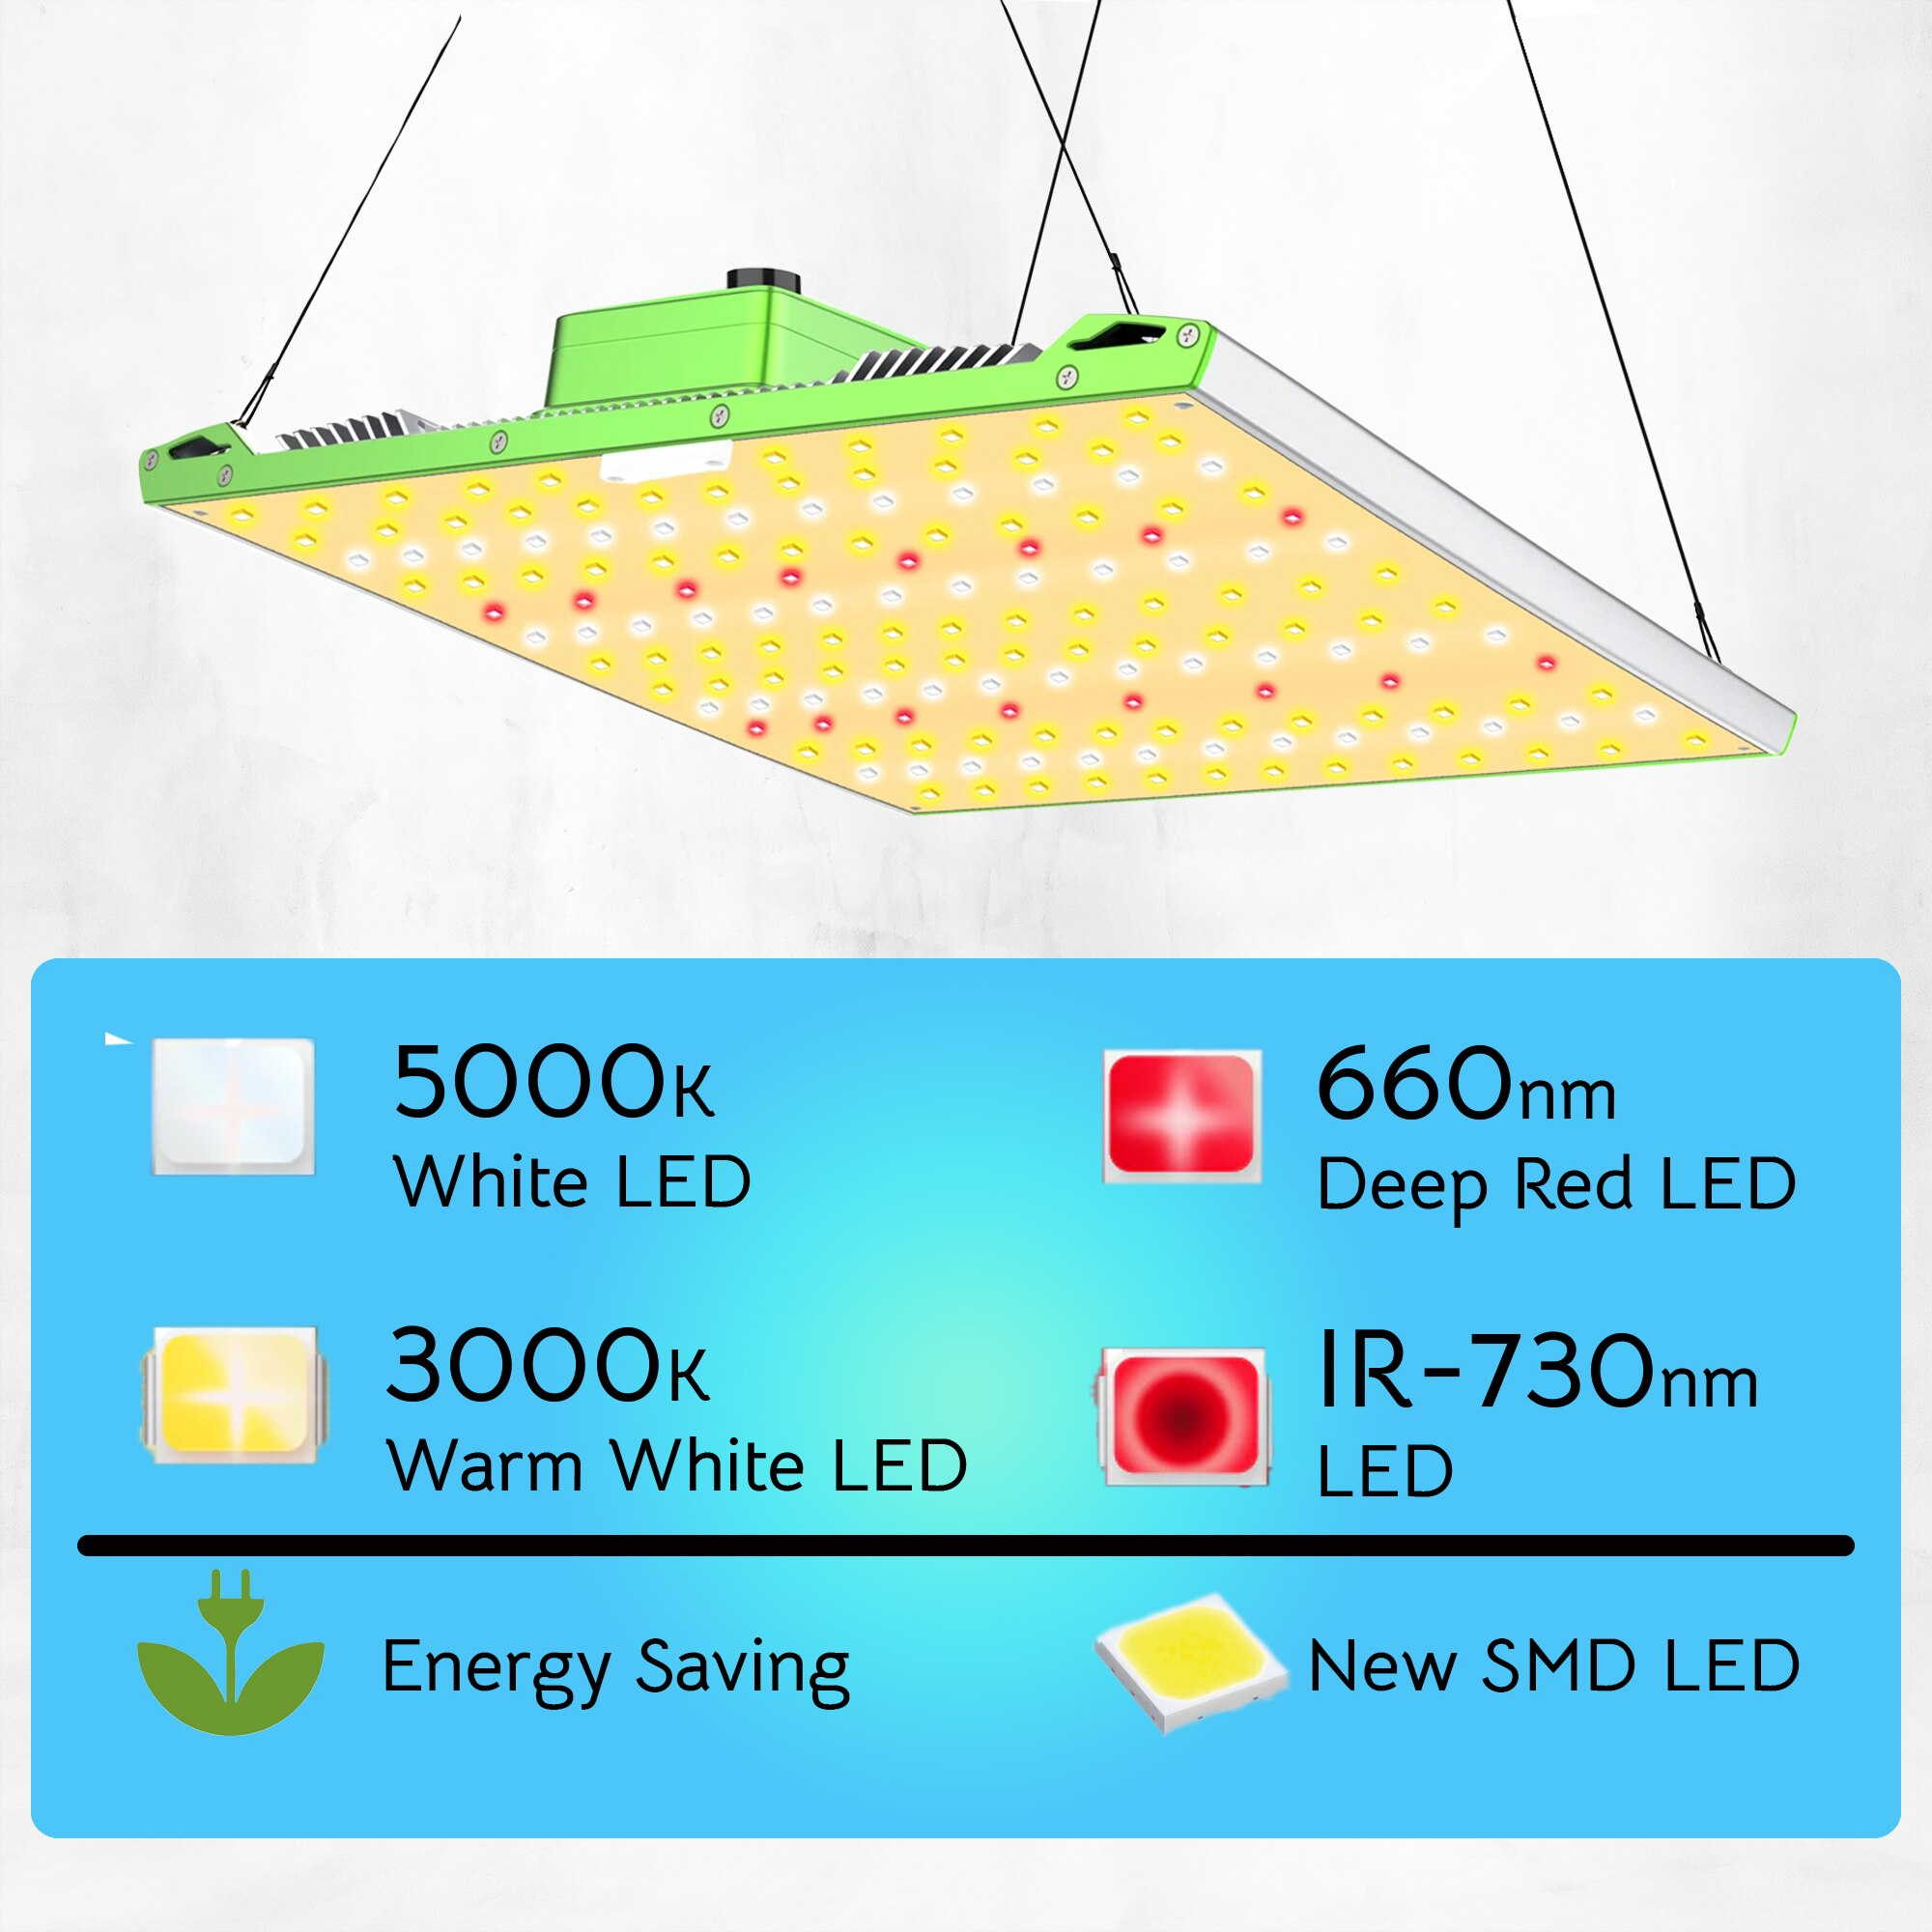 ZFR GROW LED, full spectrum 1000W Dimmable Lights Full Spectrum for Indoor Plants Seedling Veg and Bloom Plant Growing Lights enlarge